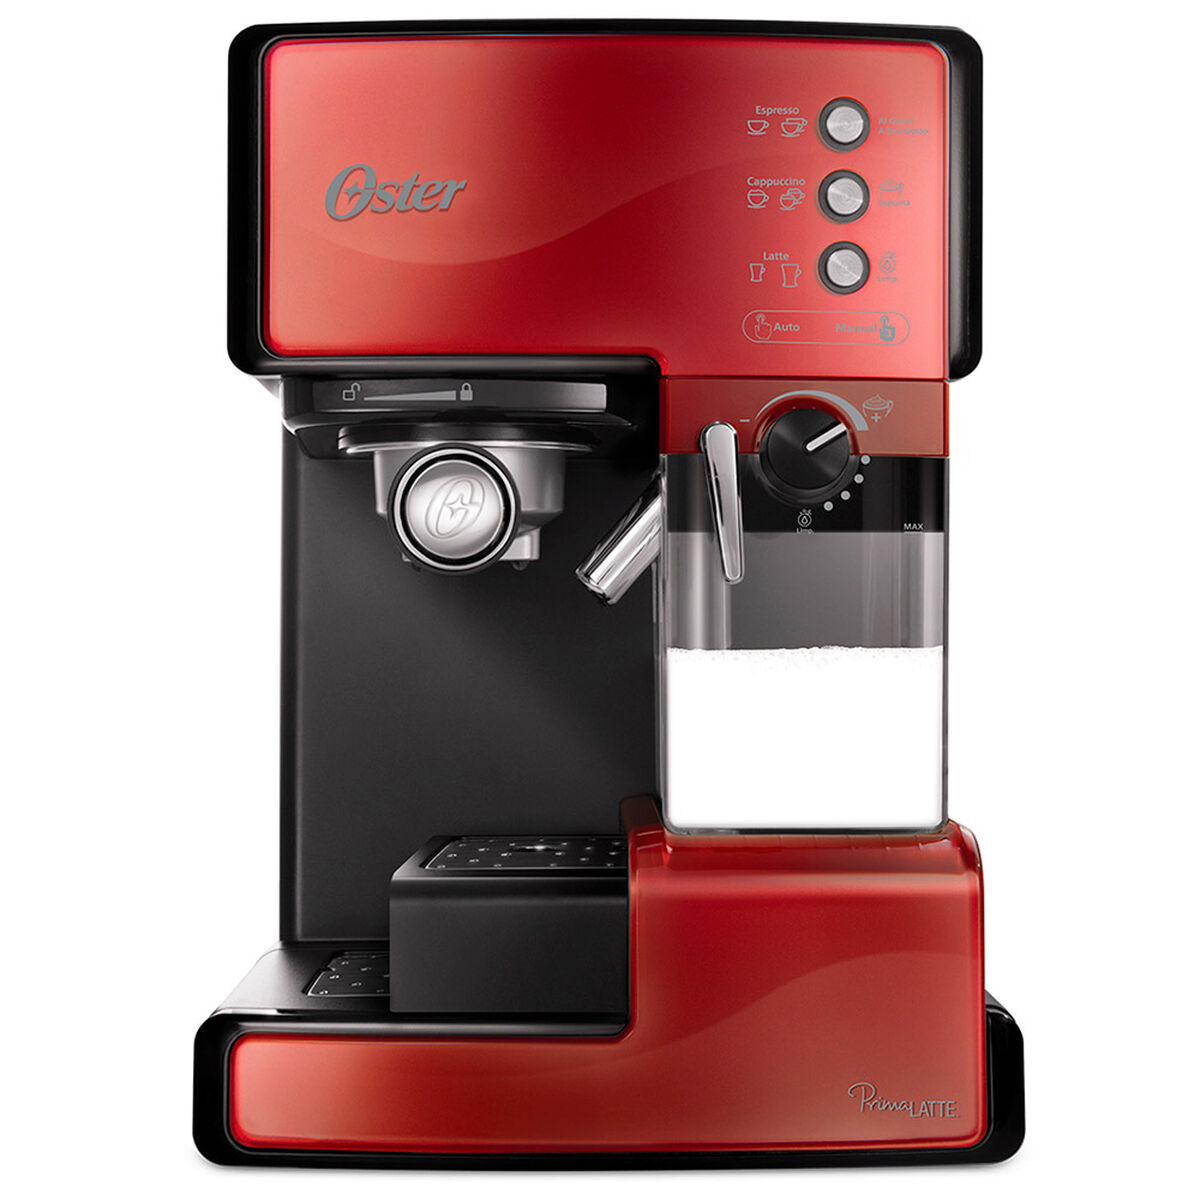 Cafetera Oster Prima Latte Roja 6601R